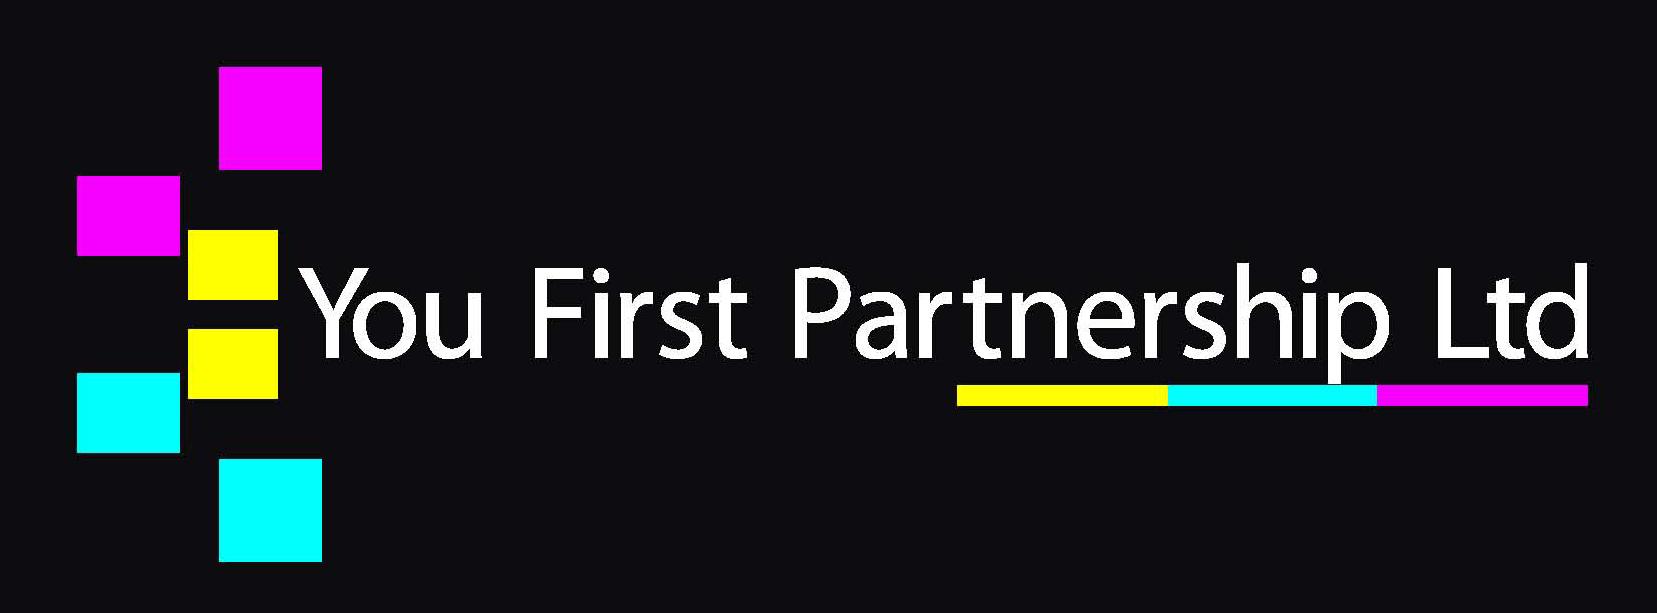 You First Partnership